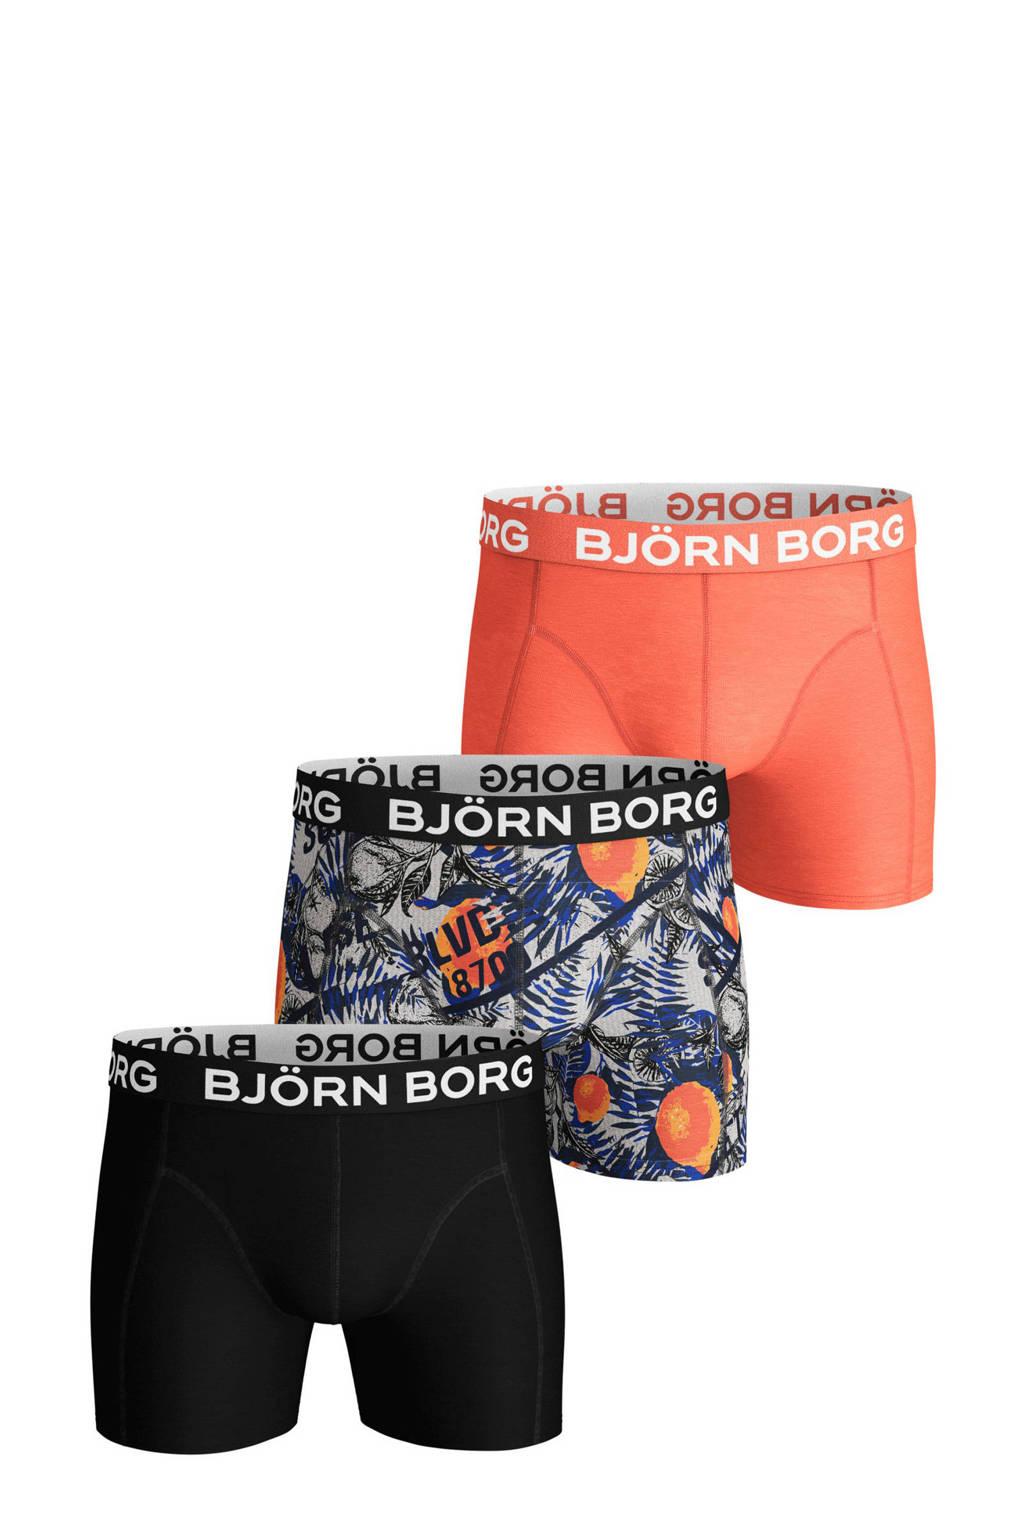 Björn Borg boxershort (set van 3), Marine/roze/zwart